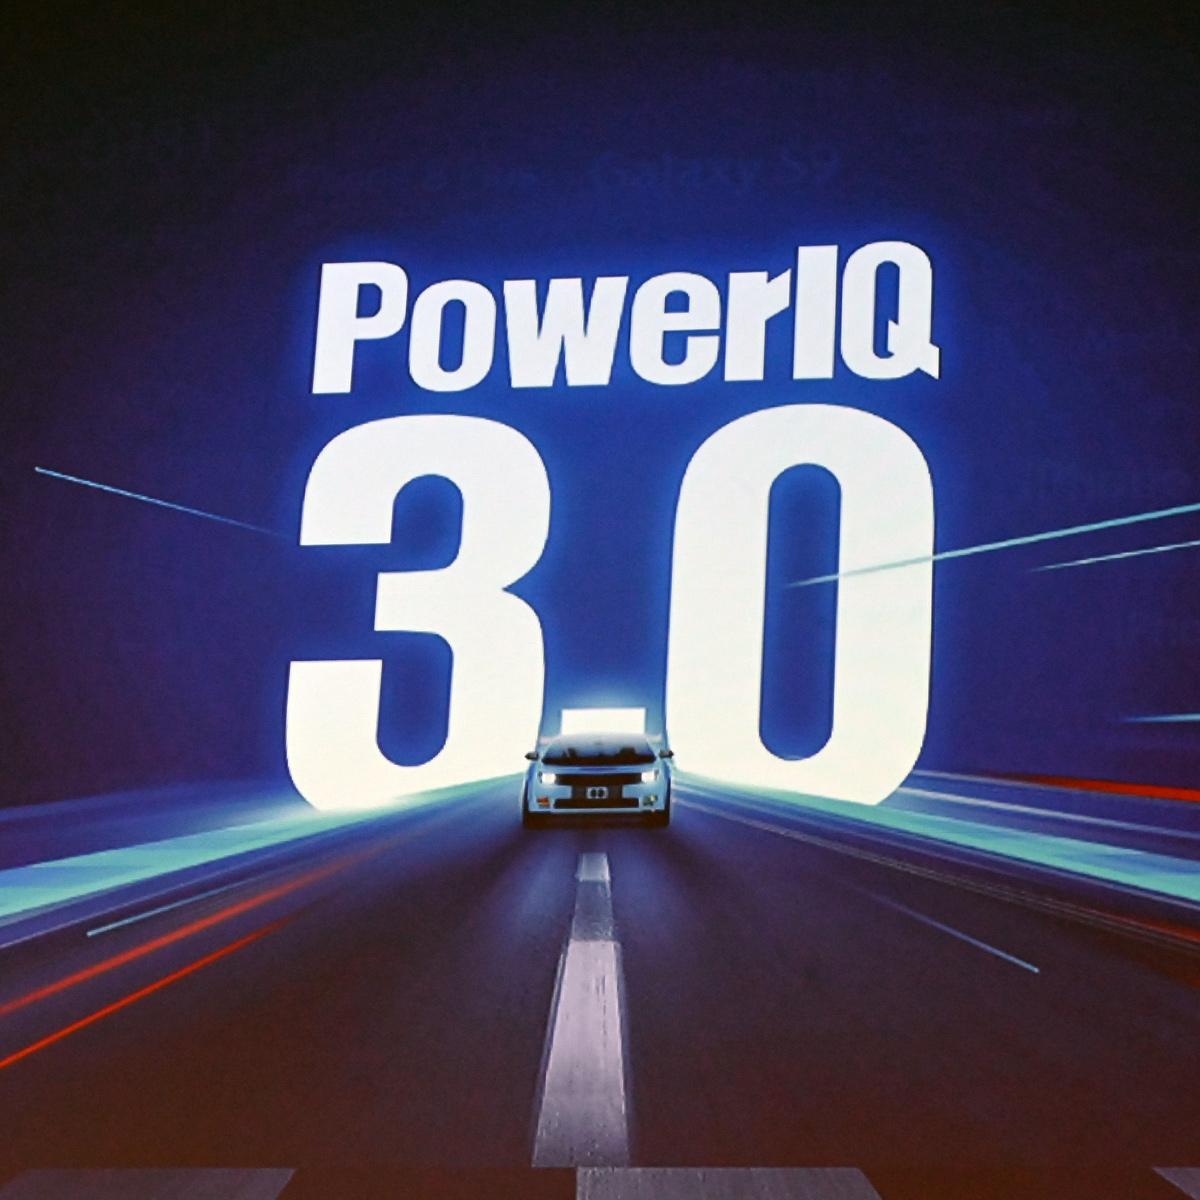 AnkerがUSB Type-C/最大100W出力対応の最新充電技術「PowerIQ 3.0」を発表! 夏発売の新製品も一挙披露